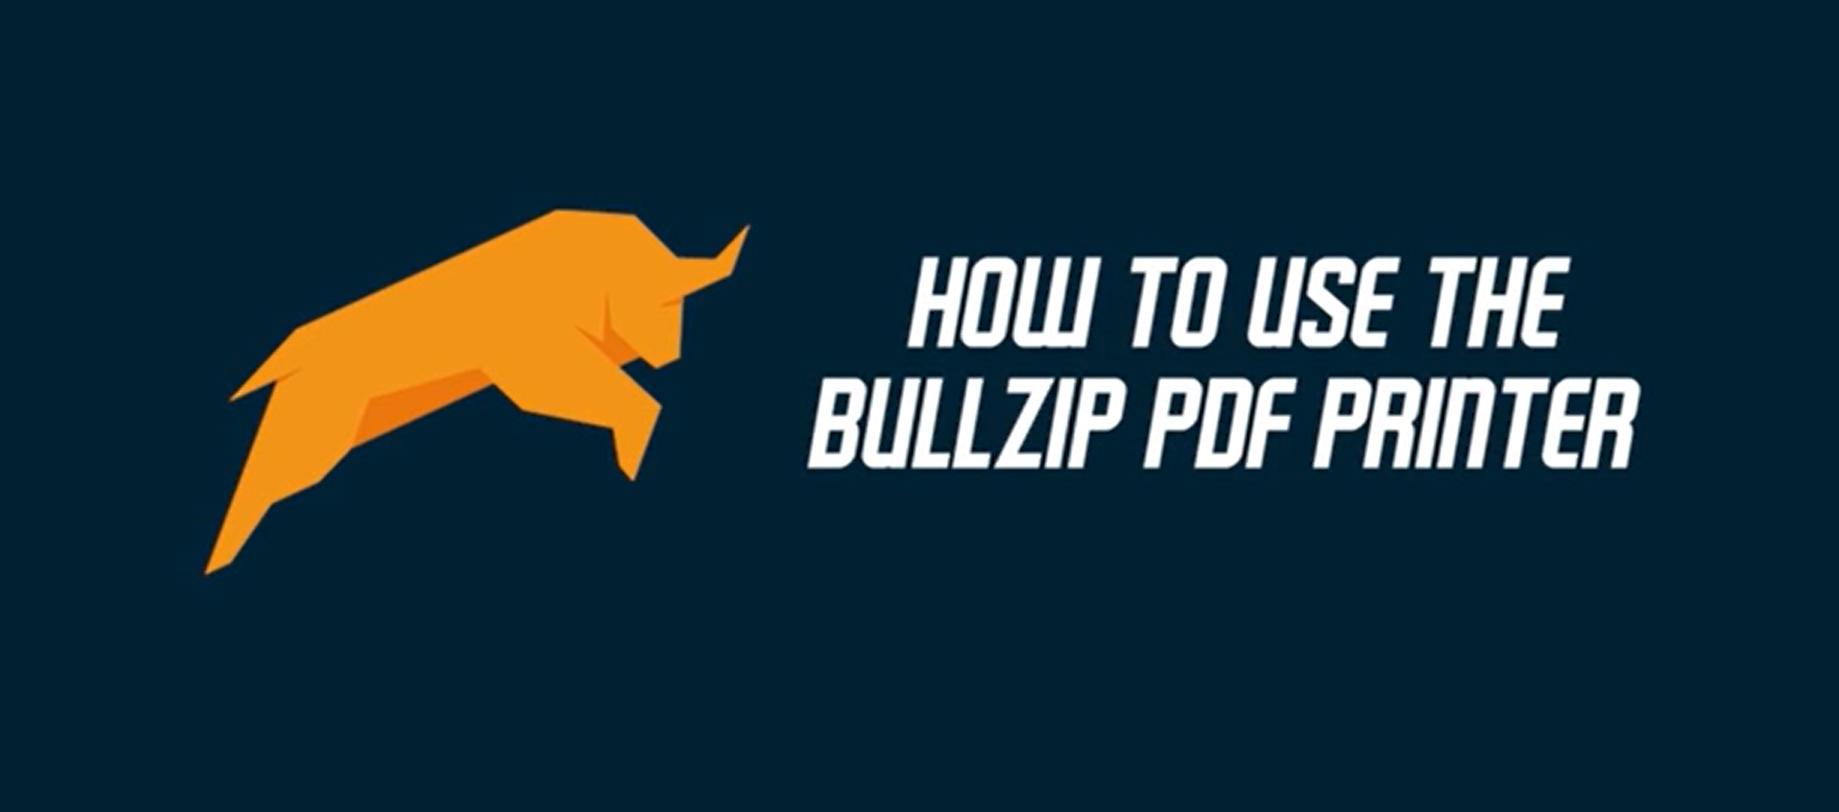 Downloading and installing the bullzip PDF Printer | bullzip PDF